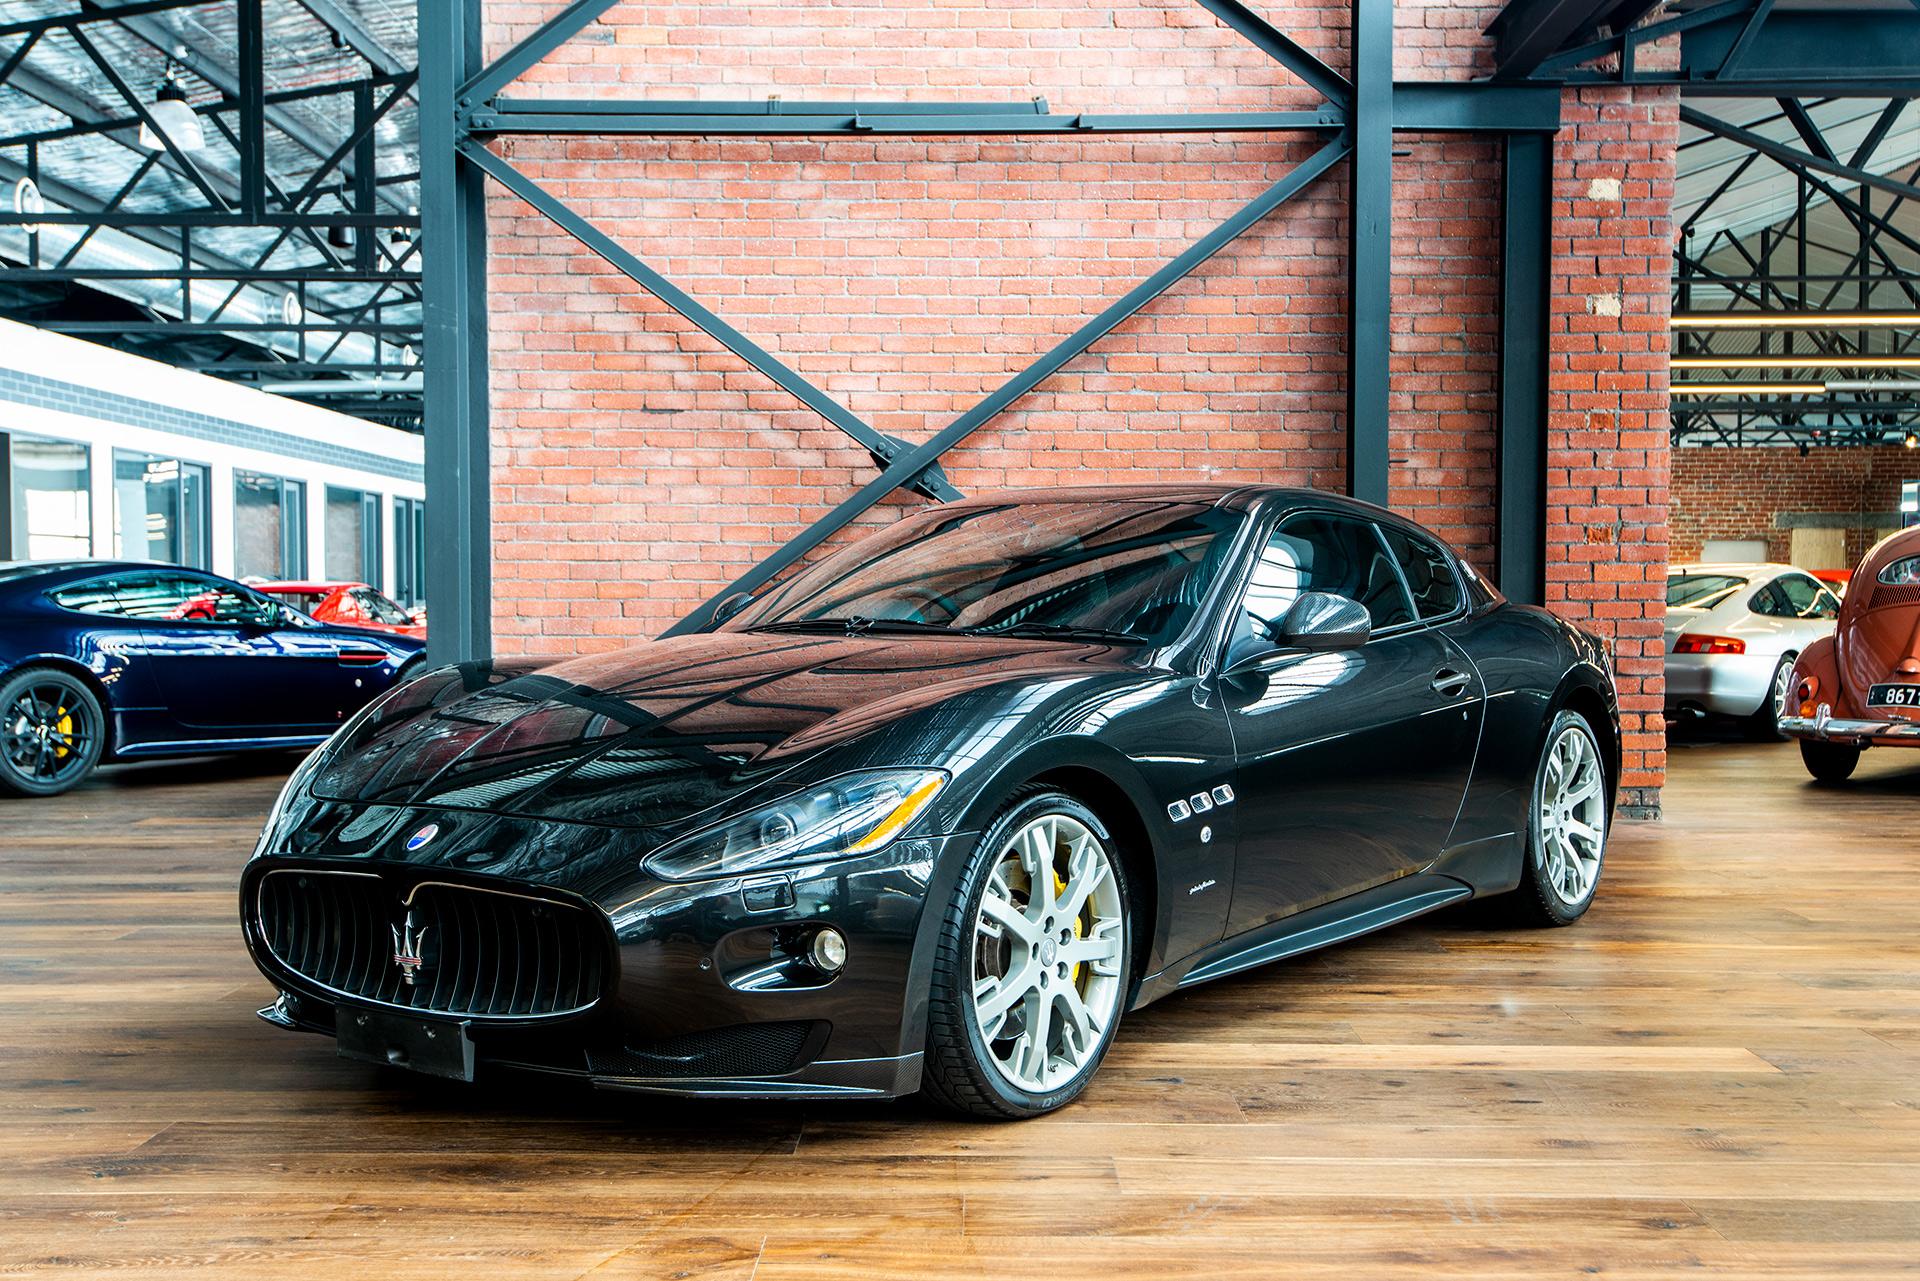 2010 Maserati GranTurismo S MC Sportline - Richmonds ...